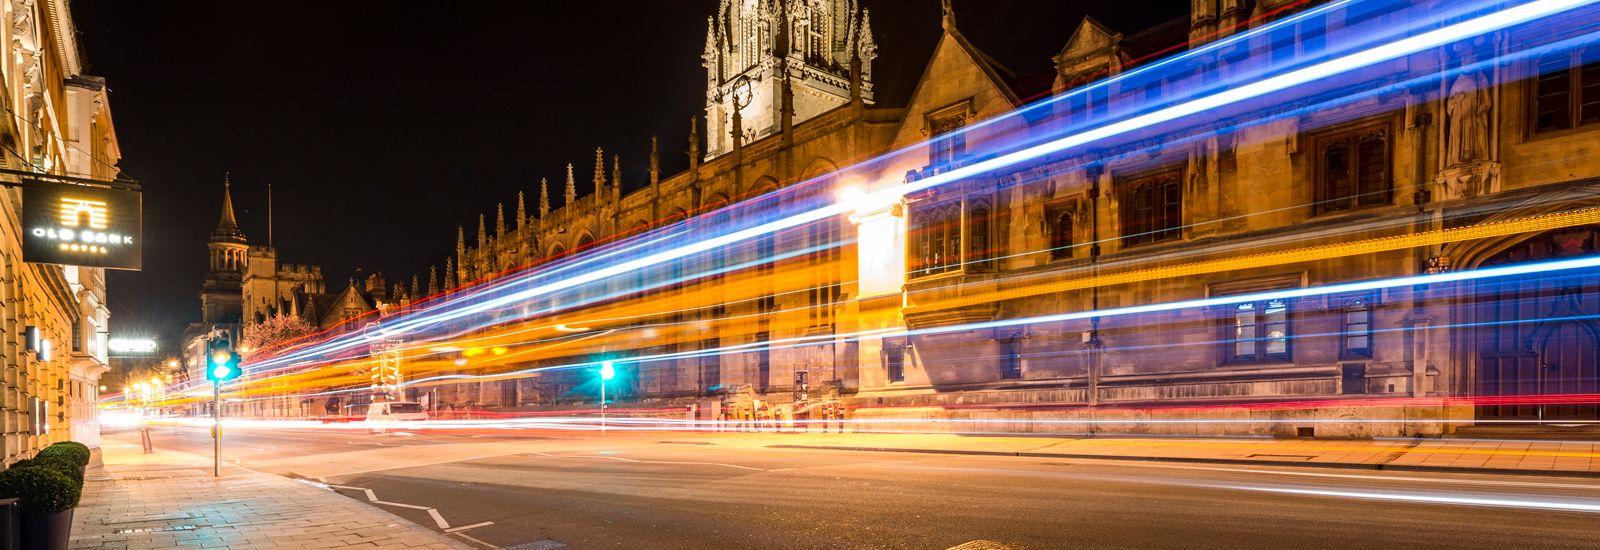 High Street in Oxford